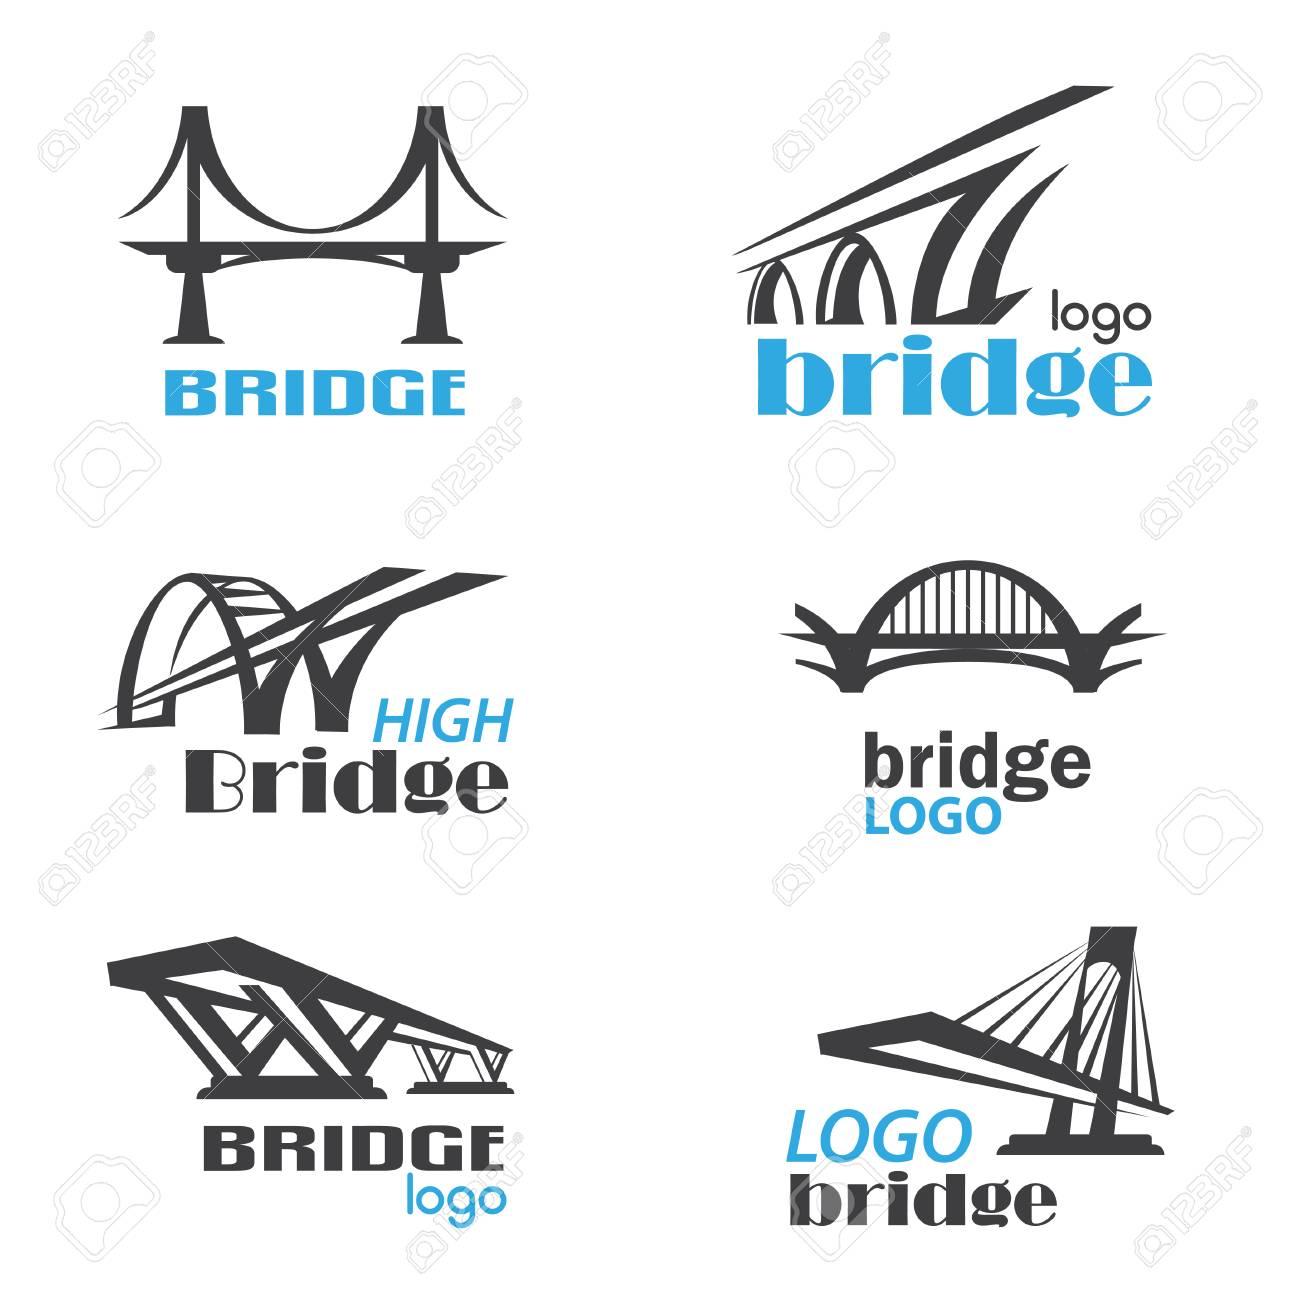 bridge symbol logo template collection - 84438787